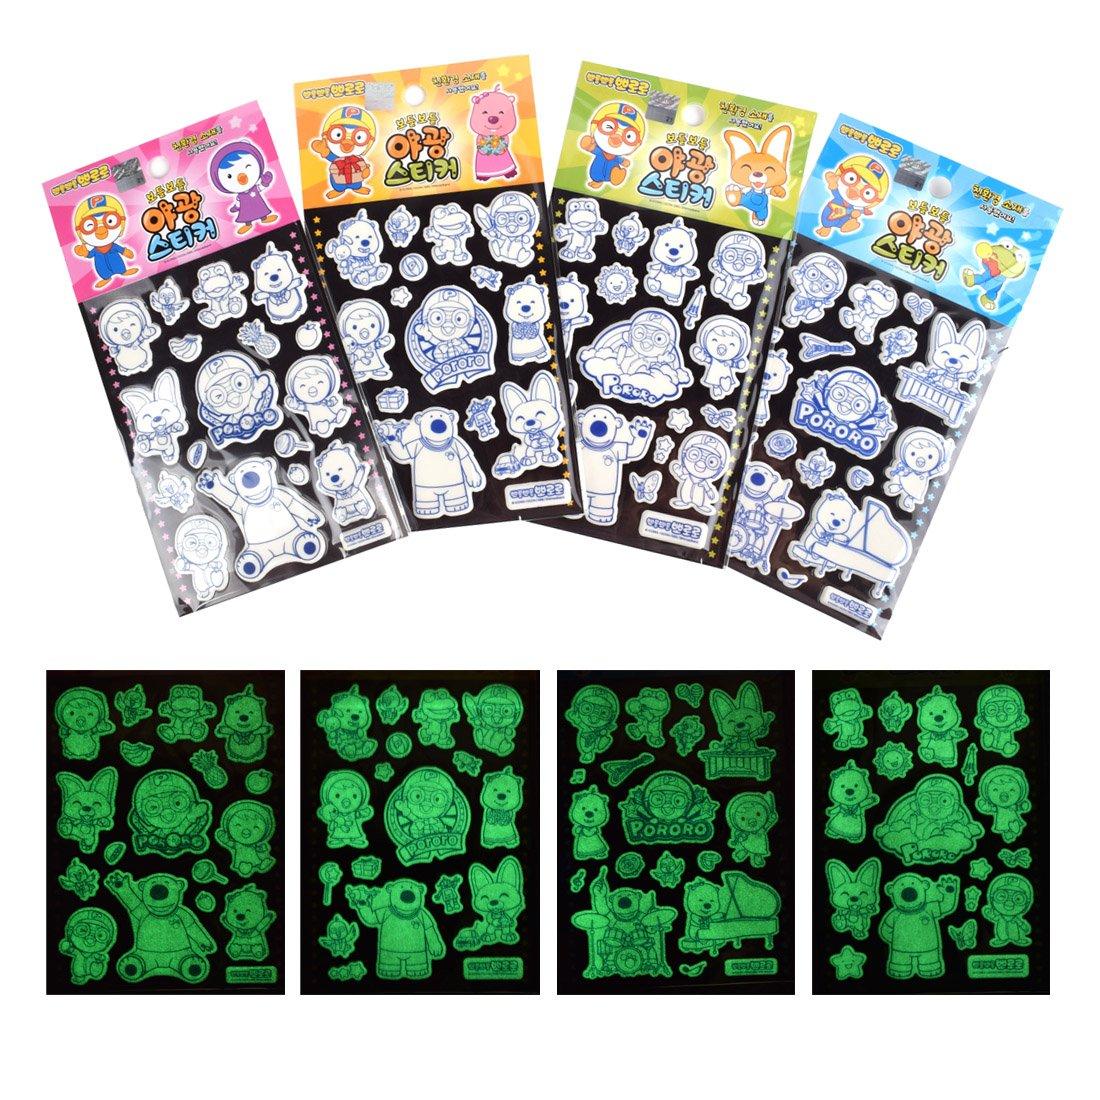 Pororo the Little Penguin Luminous Puffy Sticker JD11-213 Bundle of 4 Sheets Daelim Enterprise 4336988019